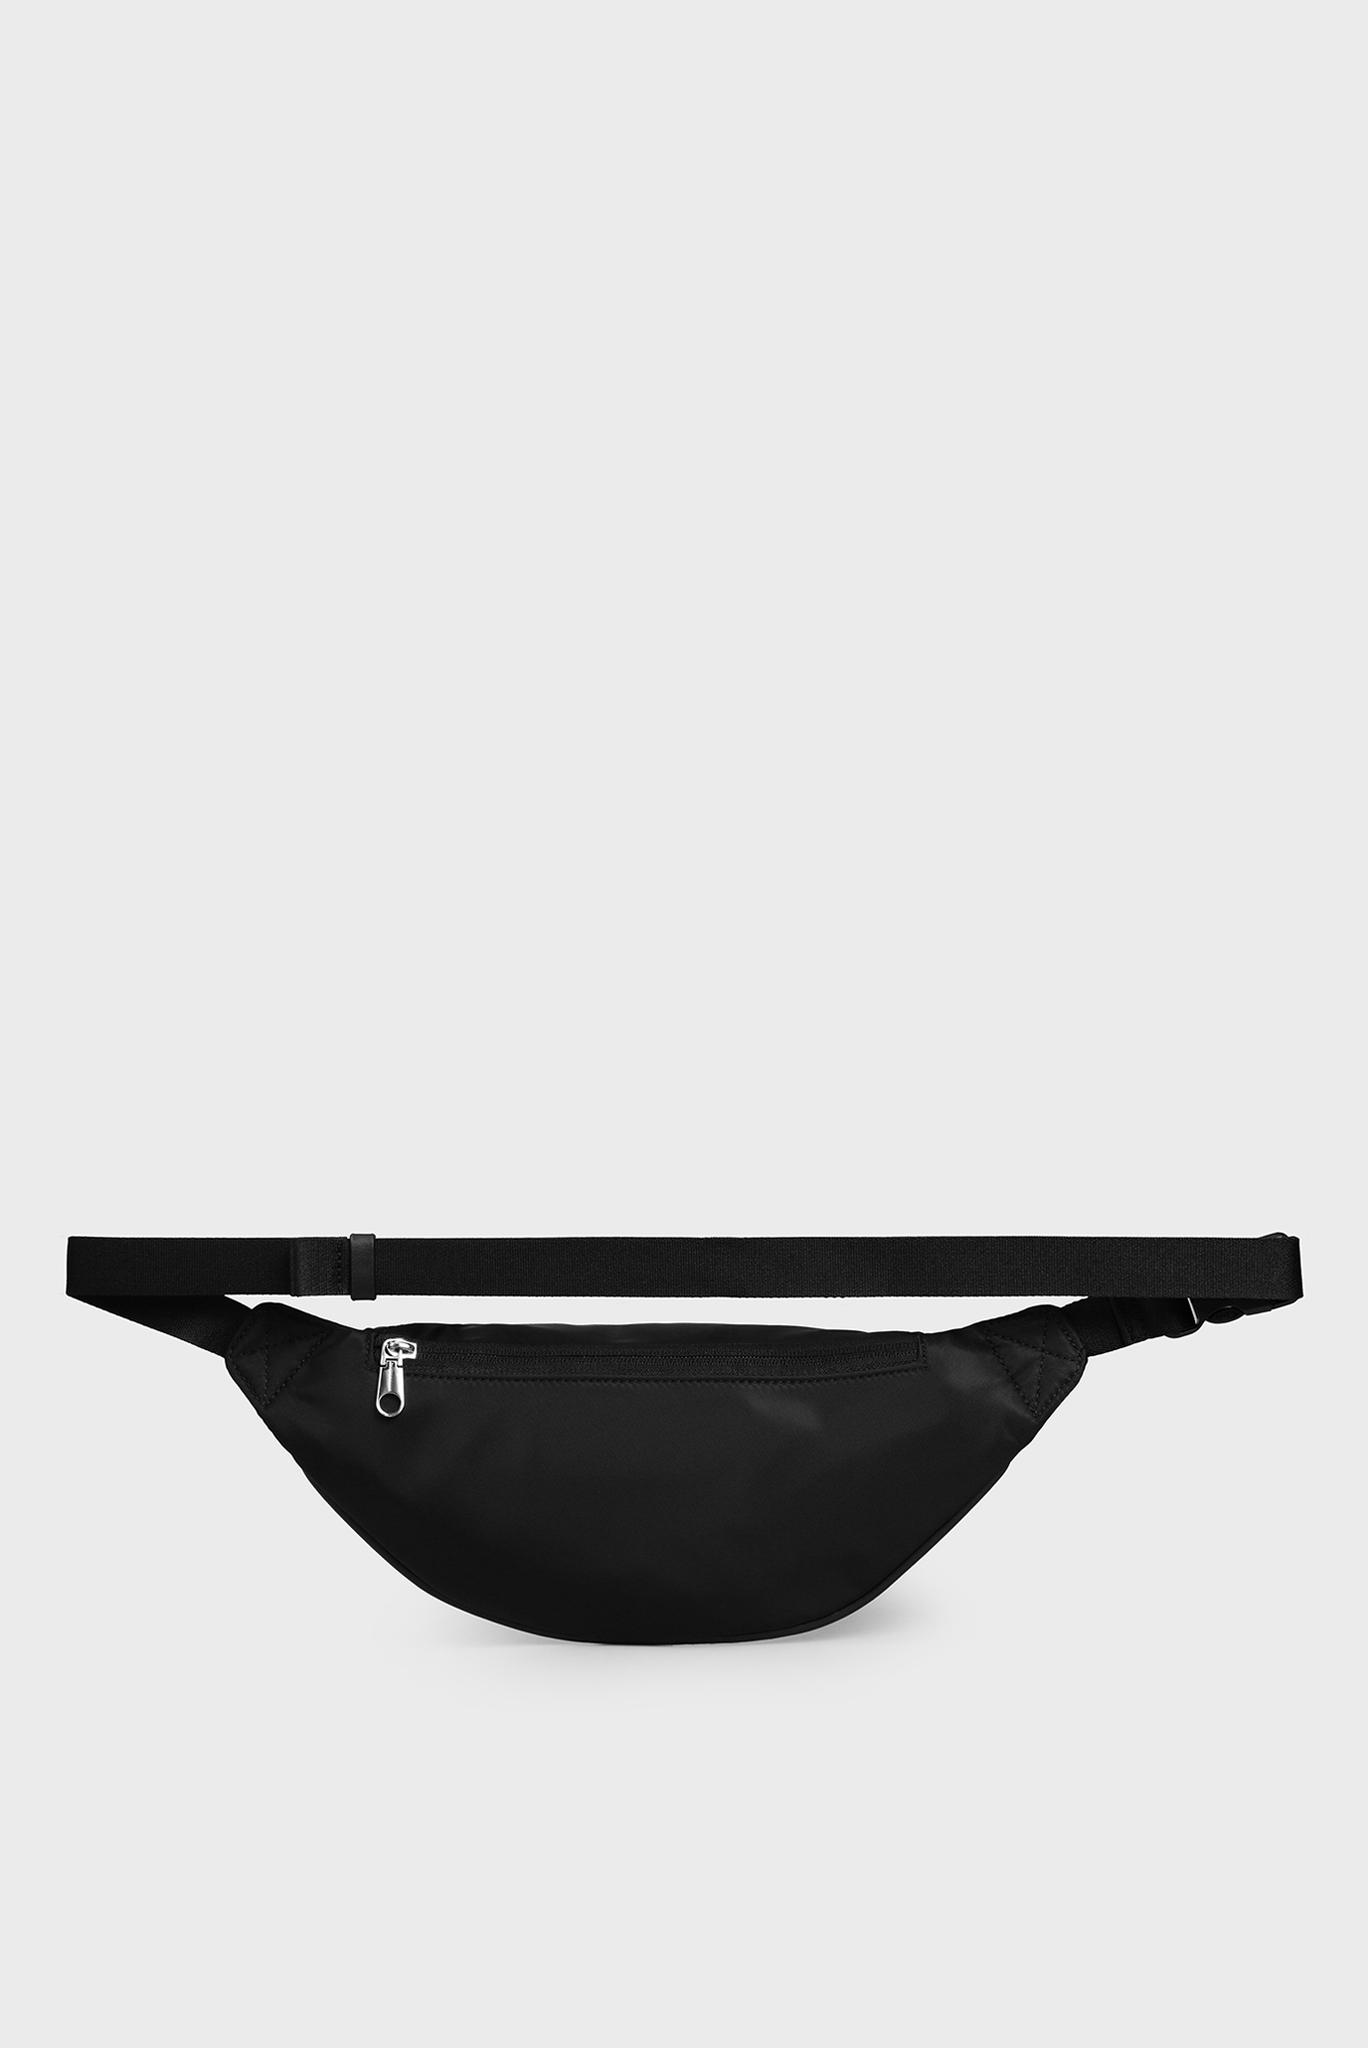 Женская черная поясная сумка Calvin Klein